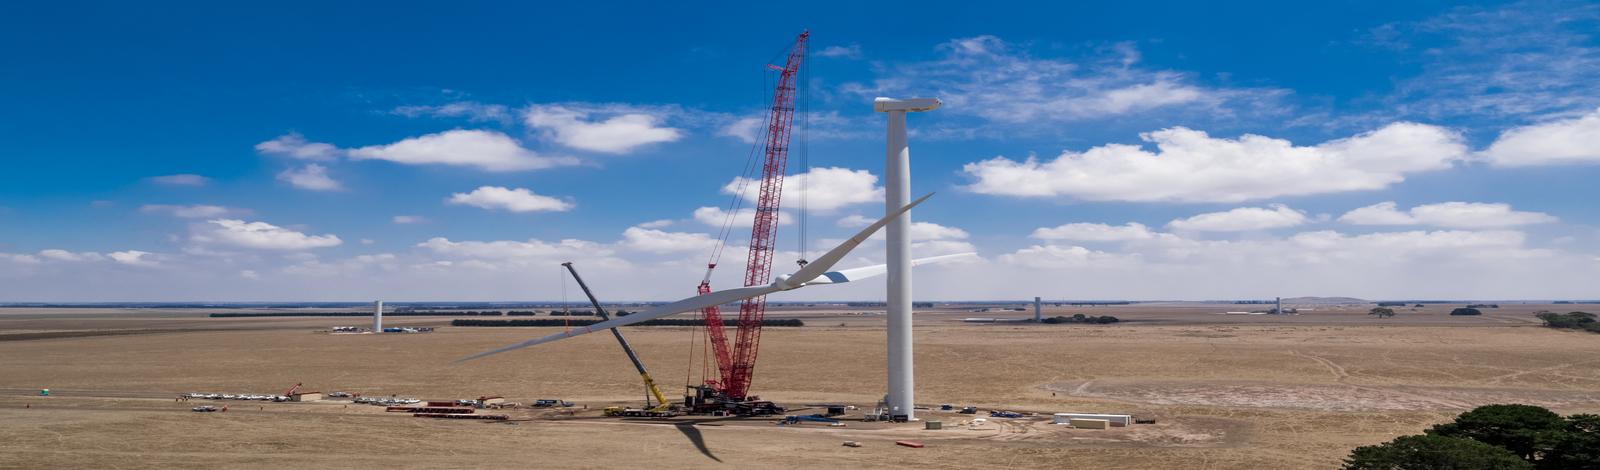 Goldwind_wind_turbine_installation_at_SHWF1__1600x470